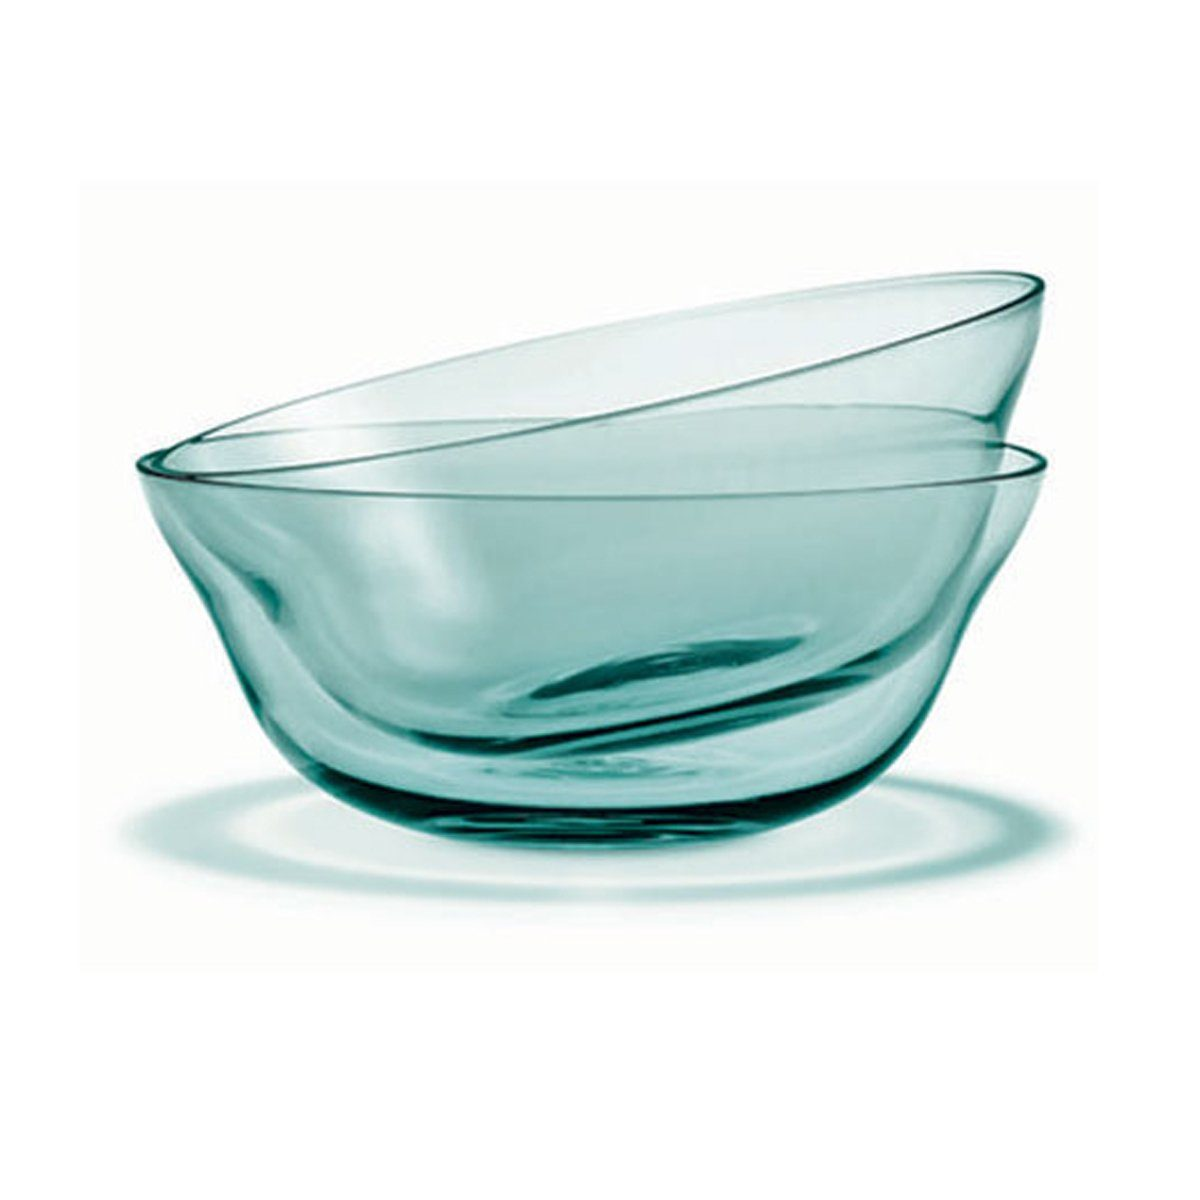 HOLMEGAARD Holmegaard Schale 2er-Set Future Wasser